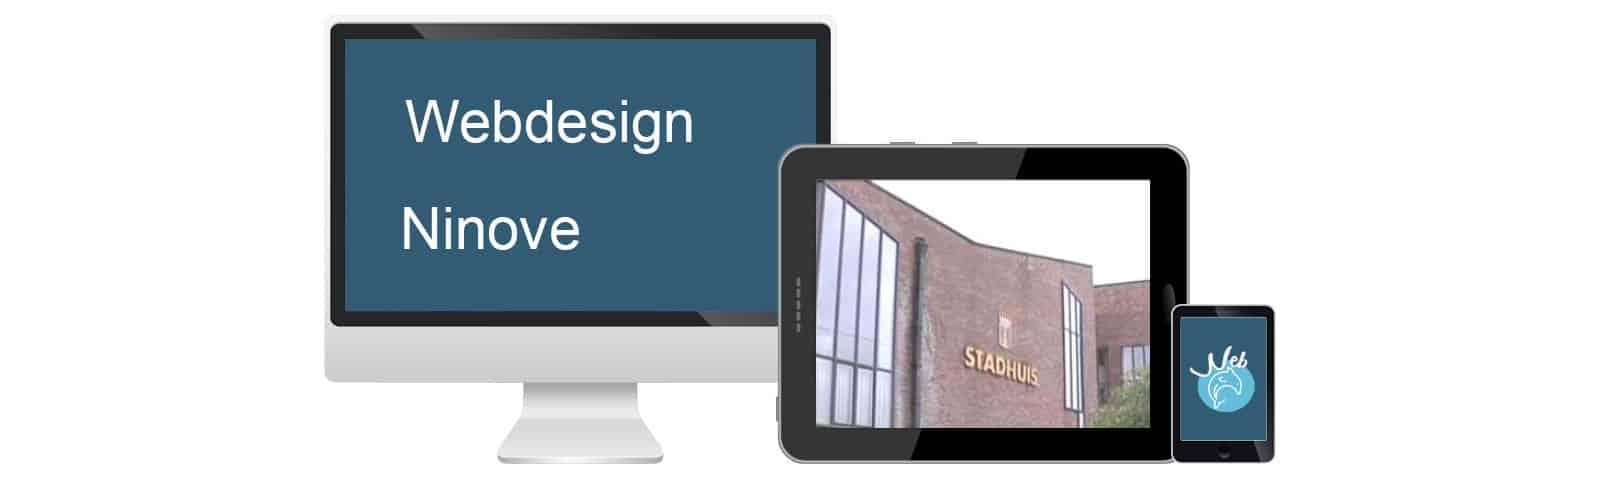 Webdesign Ninove - webdolfijn